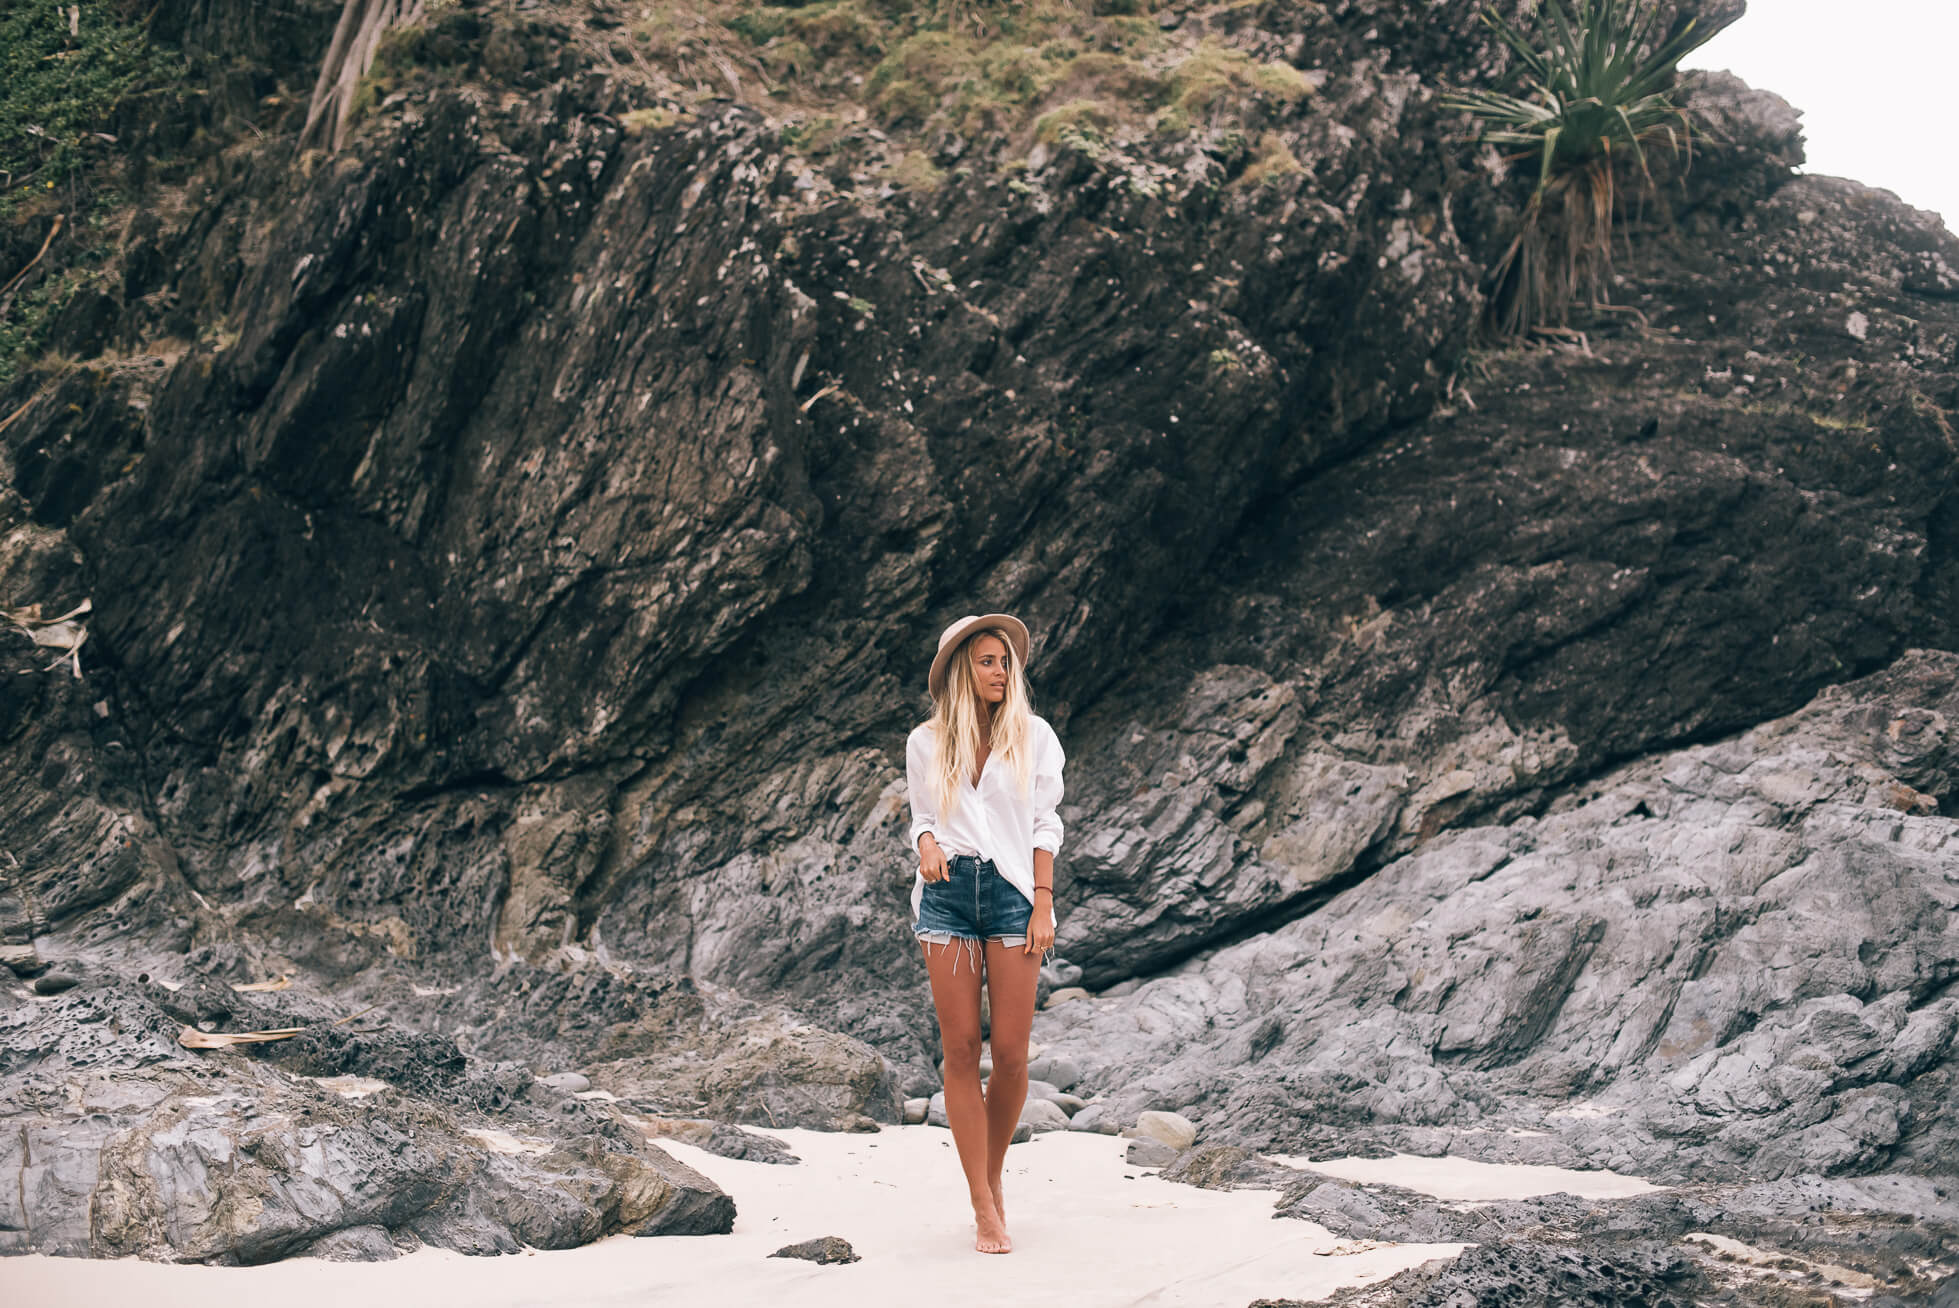 janni-deler-rocks-look-broken-headDSC_4512